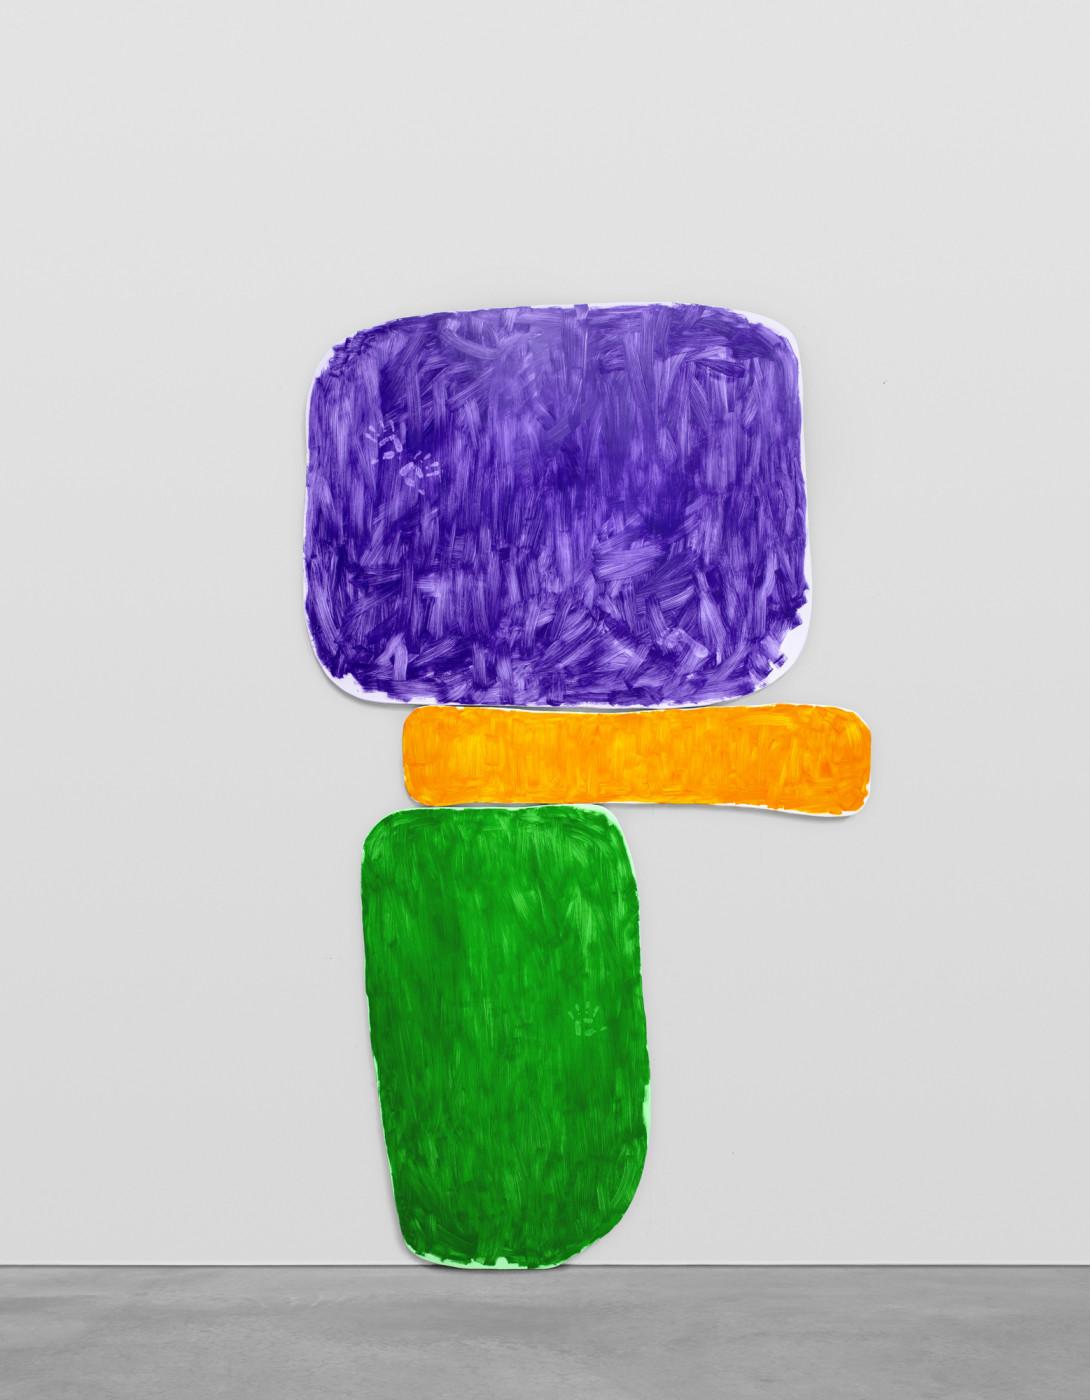 "<div class=""artwork_caption""><div class=""title""><em>zweiundzwanzigsterdezemberzweitausendundzwanzig</em>, 2020</div><div class=""medium"">oil on canvas, Perspex plaque</div><div class=""dimensions"">overall: 453.1 x 258.1 x 5.1 cm / 178 3/8 x 101 5/8 x 2 in<br />top canvas: 176 x 227 x 5cm<br />center canvas: 52 x 214 x 5cm<br />bottom canvas: 235.5 x 133 x 5cm</div></div><div class=""link""><span class=""website_contact_form"" data-contact-form-details=""zweiundzwanzigsterdezemberzweitausendundzwanzig, 2020  oil on canvas, Perspex plaque  overall: 453.1 x 258.1 x 5.1 cm / 178 3/8 x 101 5/8 x 2 in top canvas: 176 x 227 x 5cm center canvas: 52 x 214 x 5cm bottom canvas: 235.5 x 133 x 5cm"" data-contact-form-image=""https://artlogic-res.cloudinary.com/w_200,h_200,c_fill,f_auto,fl_lossy/ws-sadiecoles/usr/exhibitions/images/exhibitions/852/hq24-ur17035p-image.jpg"">Enquire</span></div>"